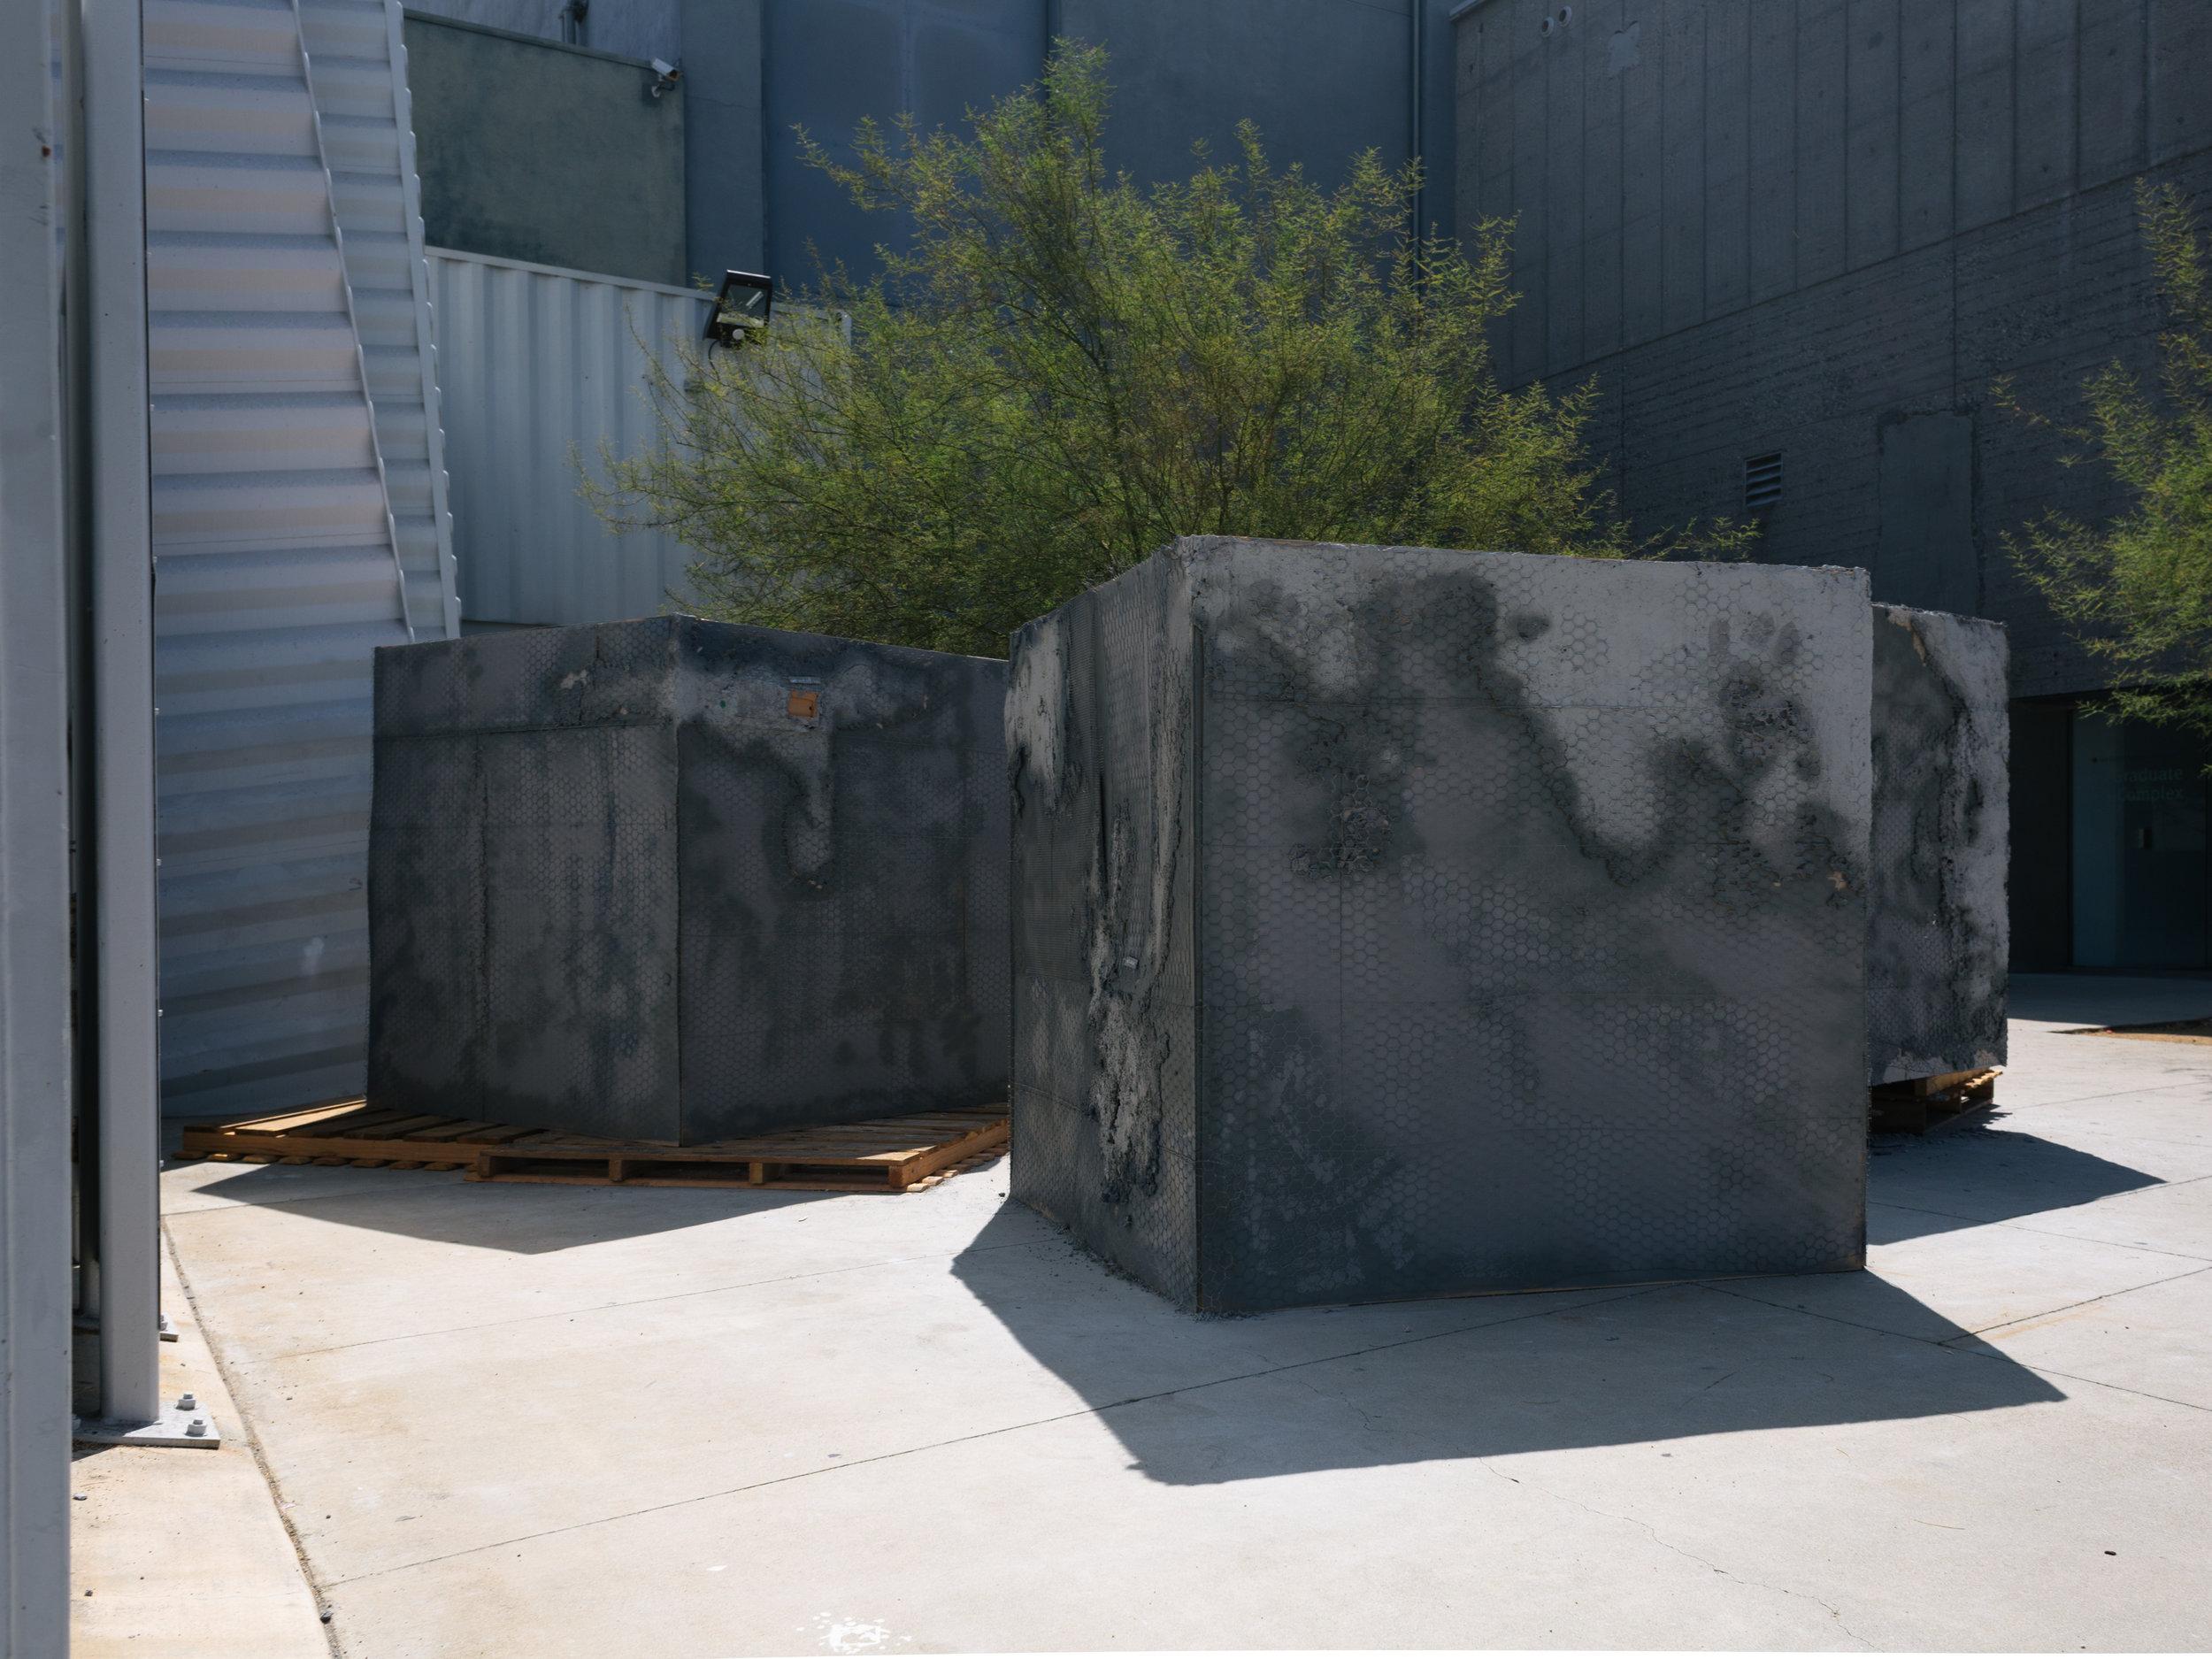 kaf-installation-9788.jpg